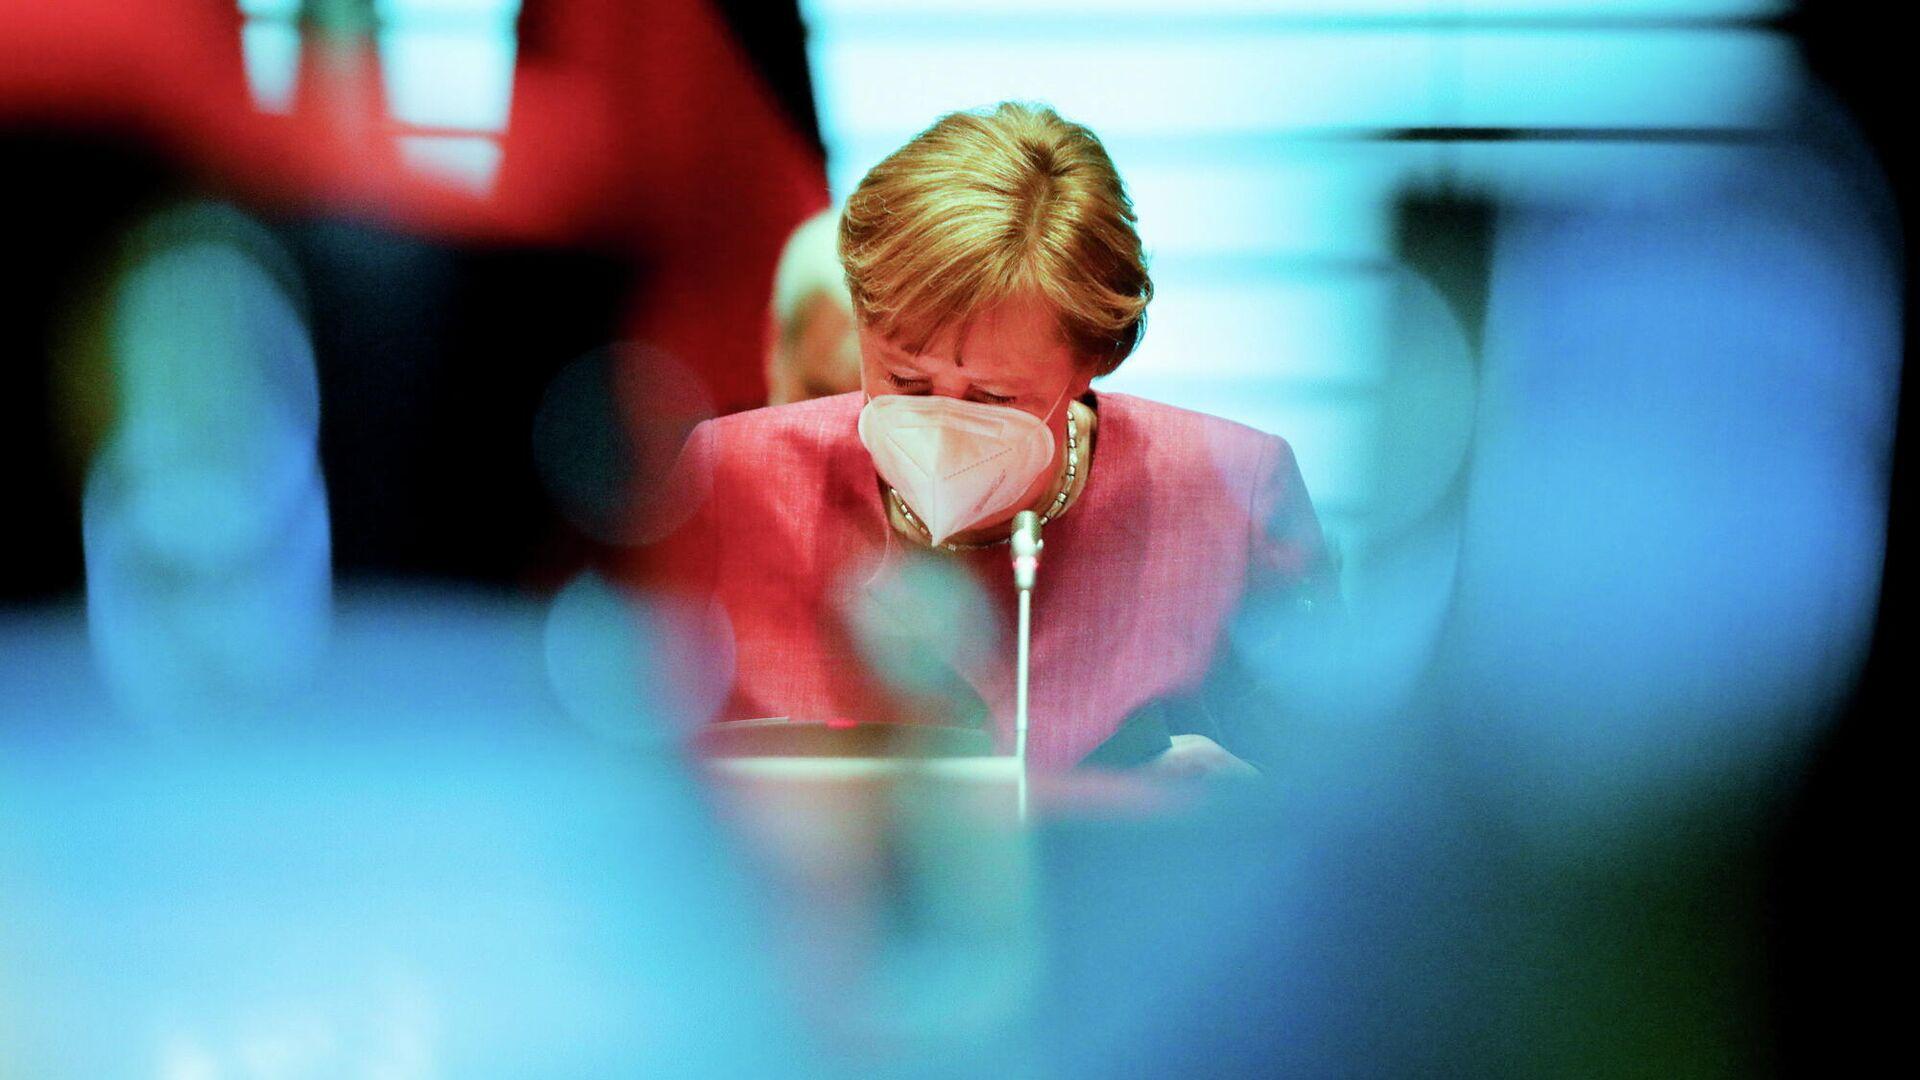 Bundeskanzlerin Angela Merkel bei der Kabinettsitzung am 27. April 2021 - SNA, 1920, 24.05.2021